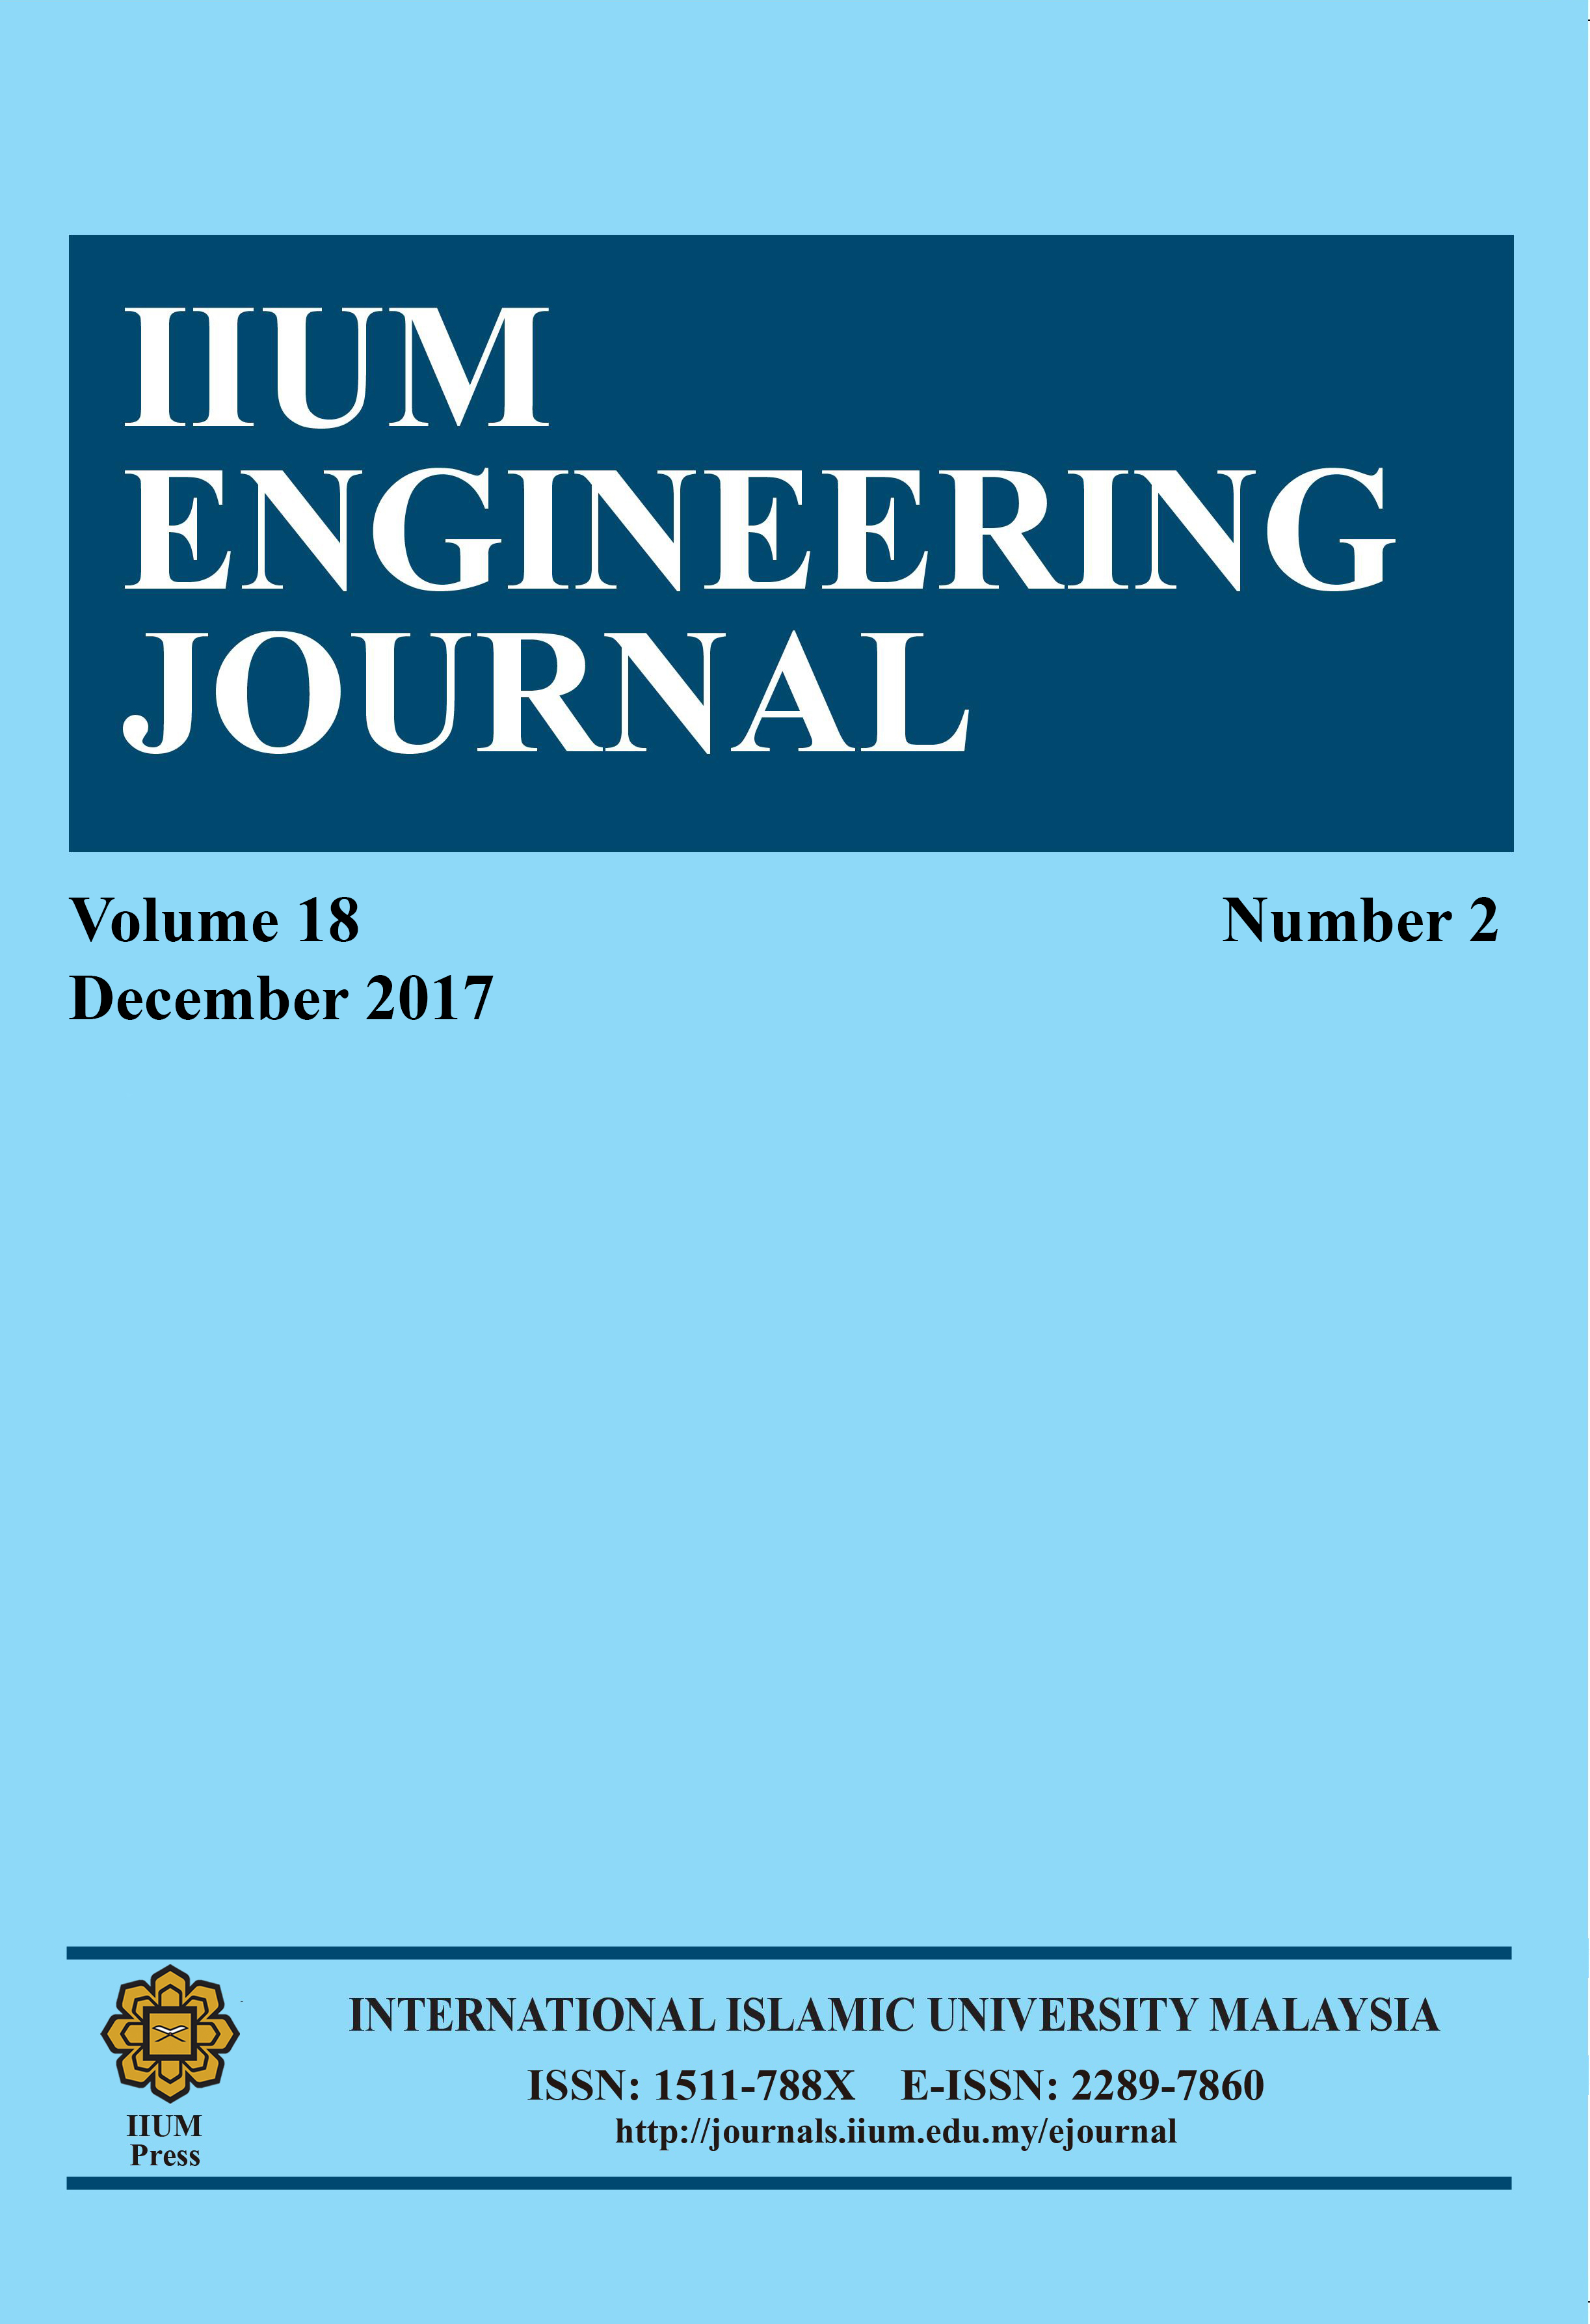 Volume 18 No 2 December 2017